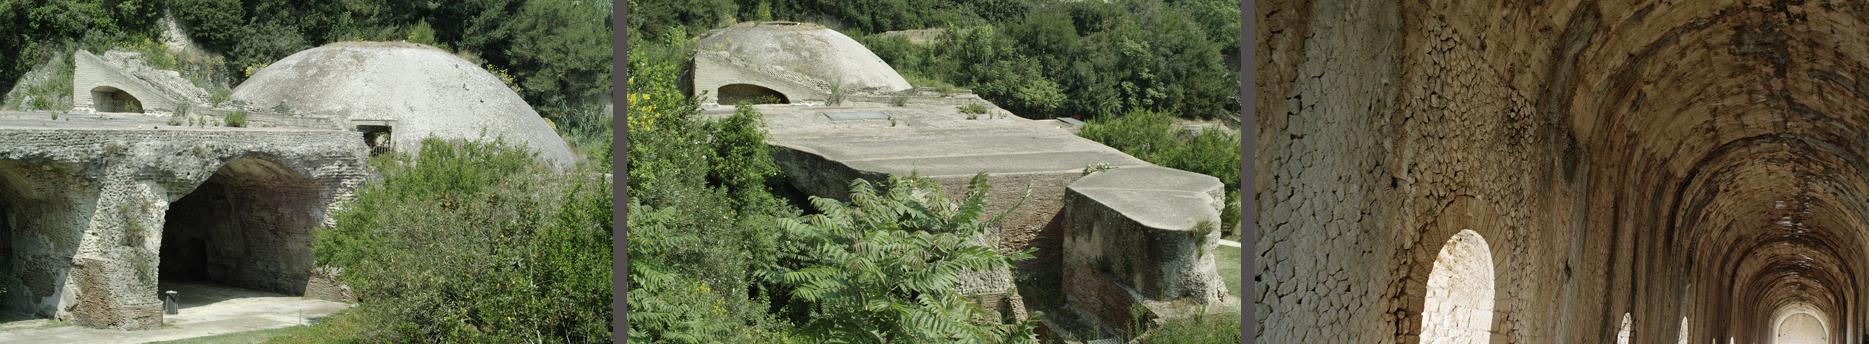 Tempio di Giove Anxur, Tempio di Giove Anxur